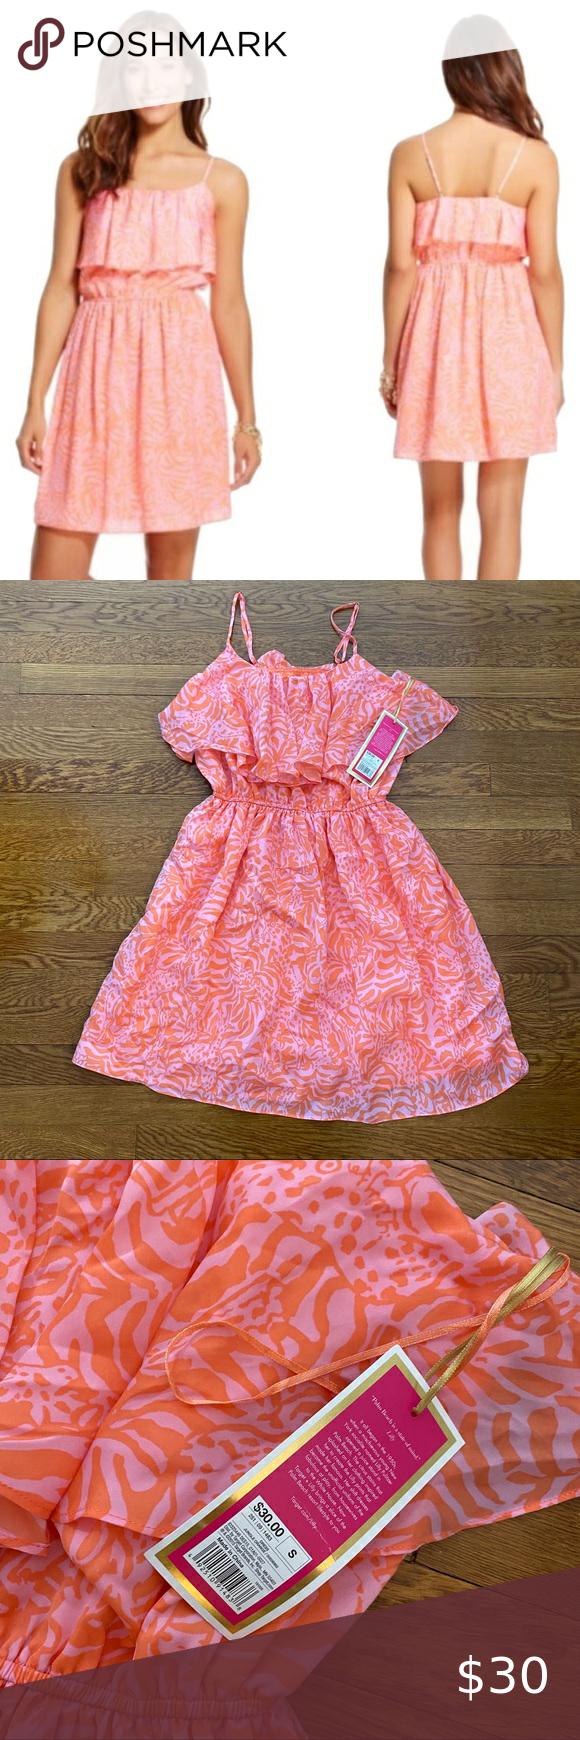 Lilly Pulitzer For Target Pink And Orange Dress Orange Dress Clothes Design Dresses [ 1740 x 580 Pixel ]